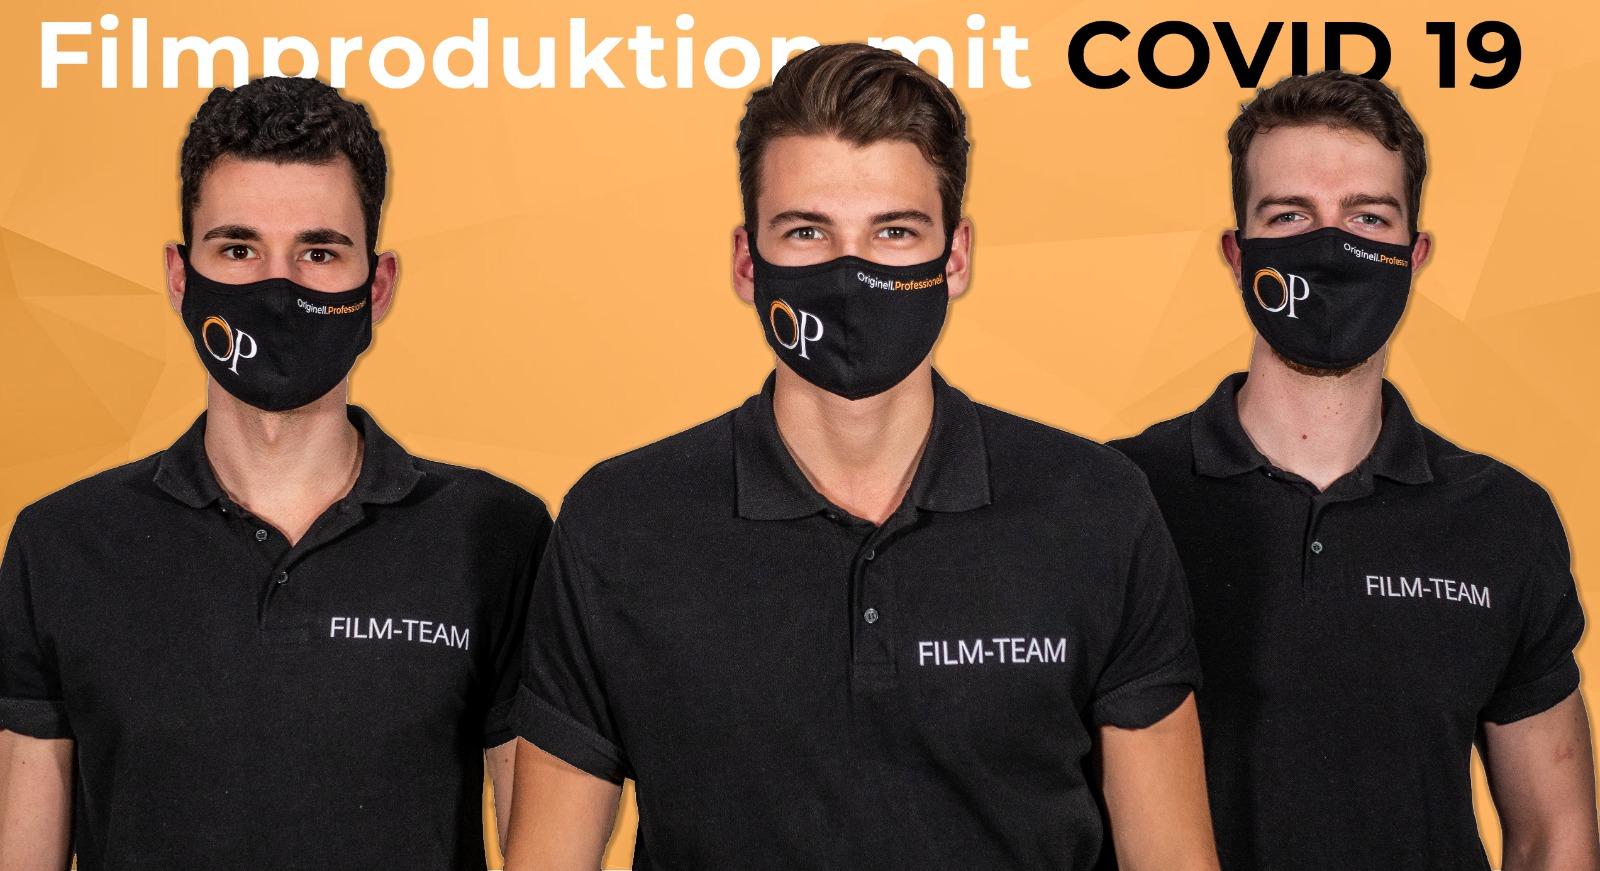 Filmproduktion_Mannheim_Heidelberg_COVID_CORONA